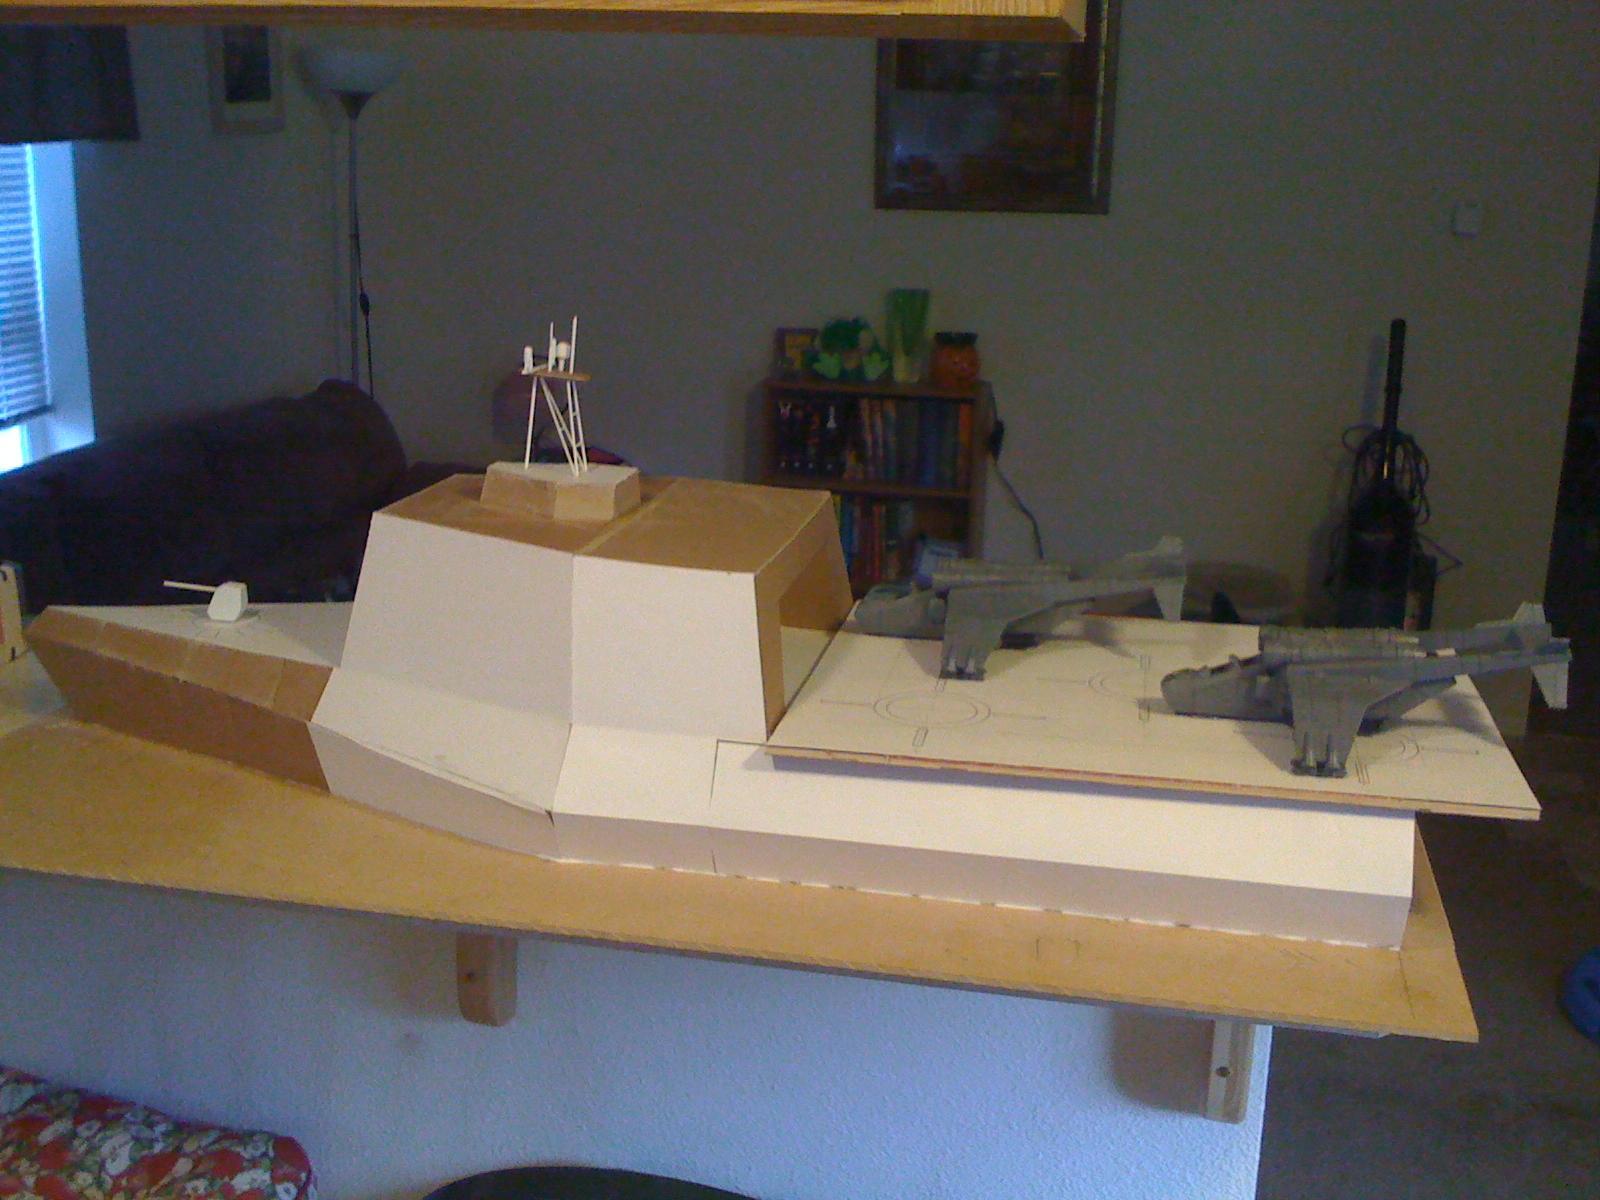 Aircraft Carrier, Boat, Built, Frigate, Guard, Imperial, Scratch, Ship, Warhammer 40,000, Work In Progress